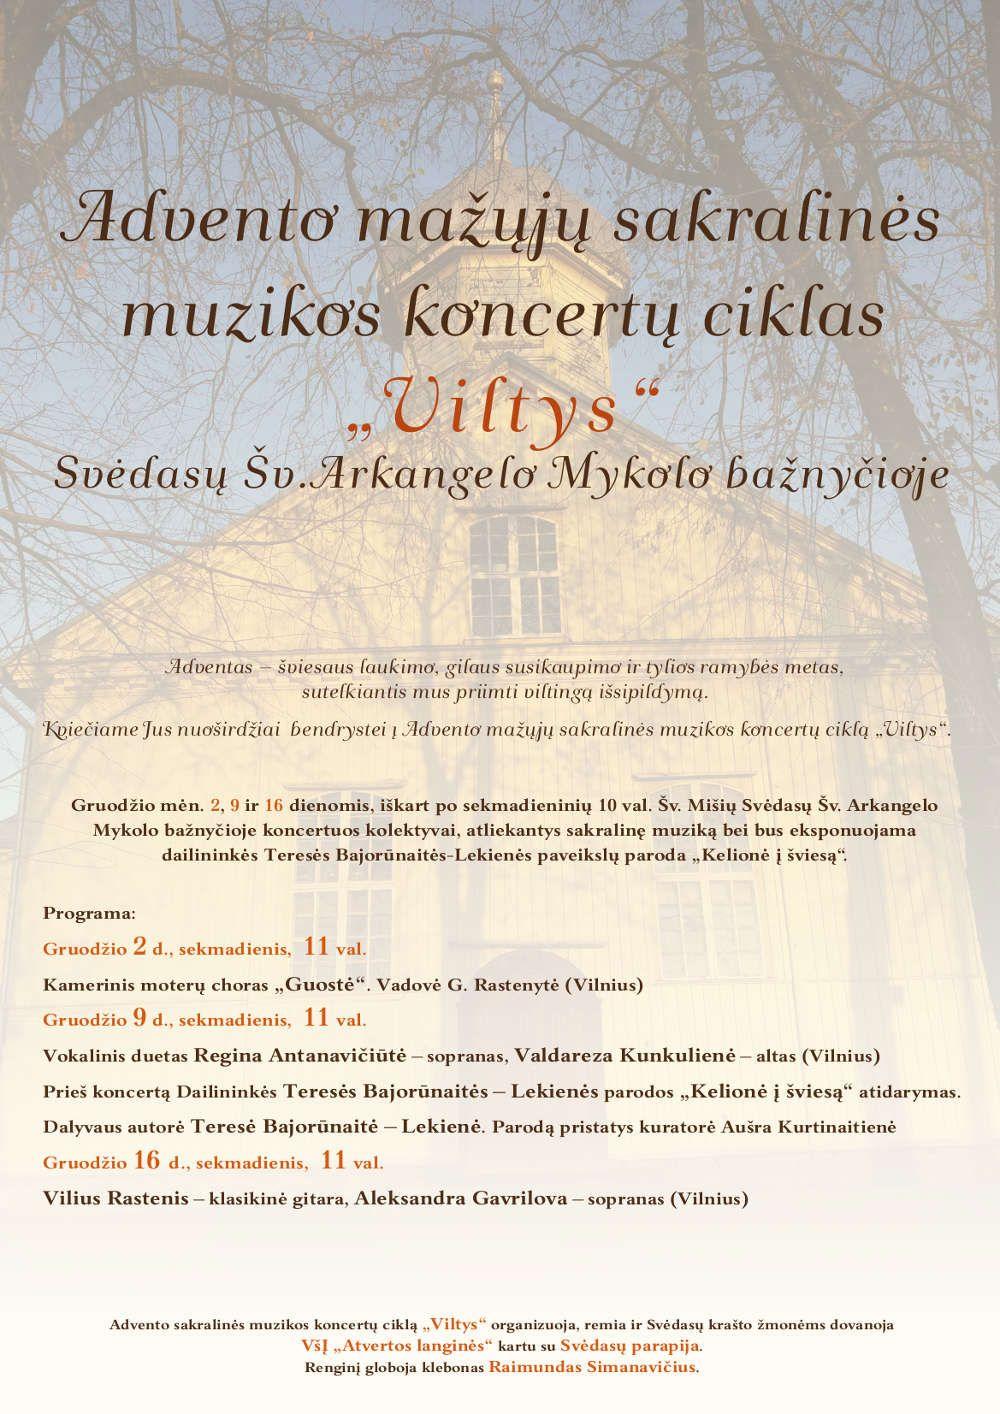 "Koncertų ciklas ""Viltys"" / Vokalinis duetas Regina Antanavičiūtė - sopranas, Valdareza Kunkulienė - altas"